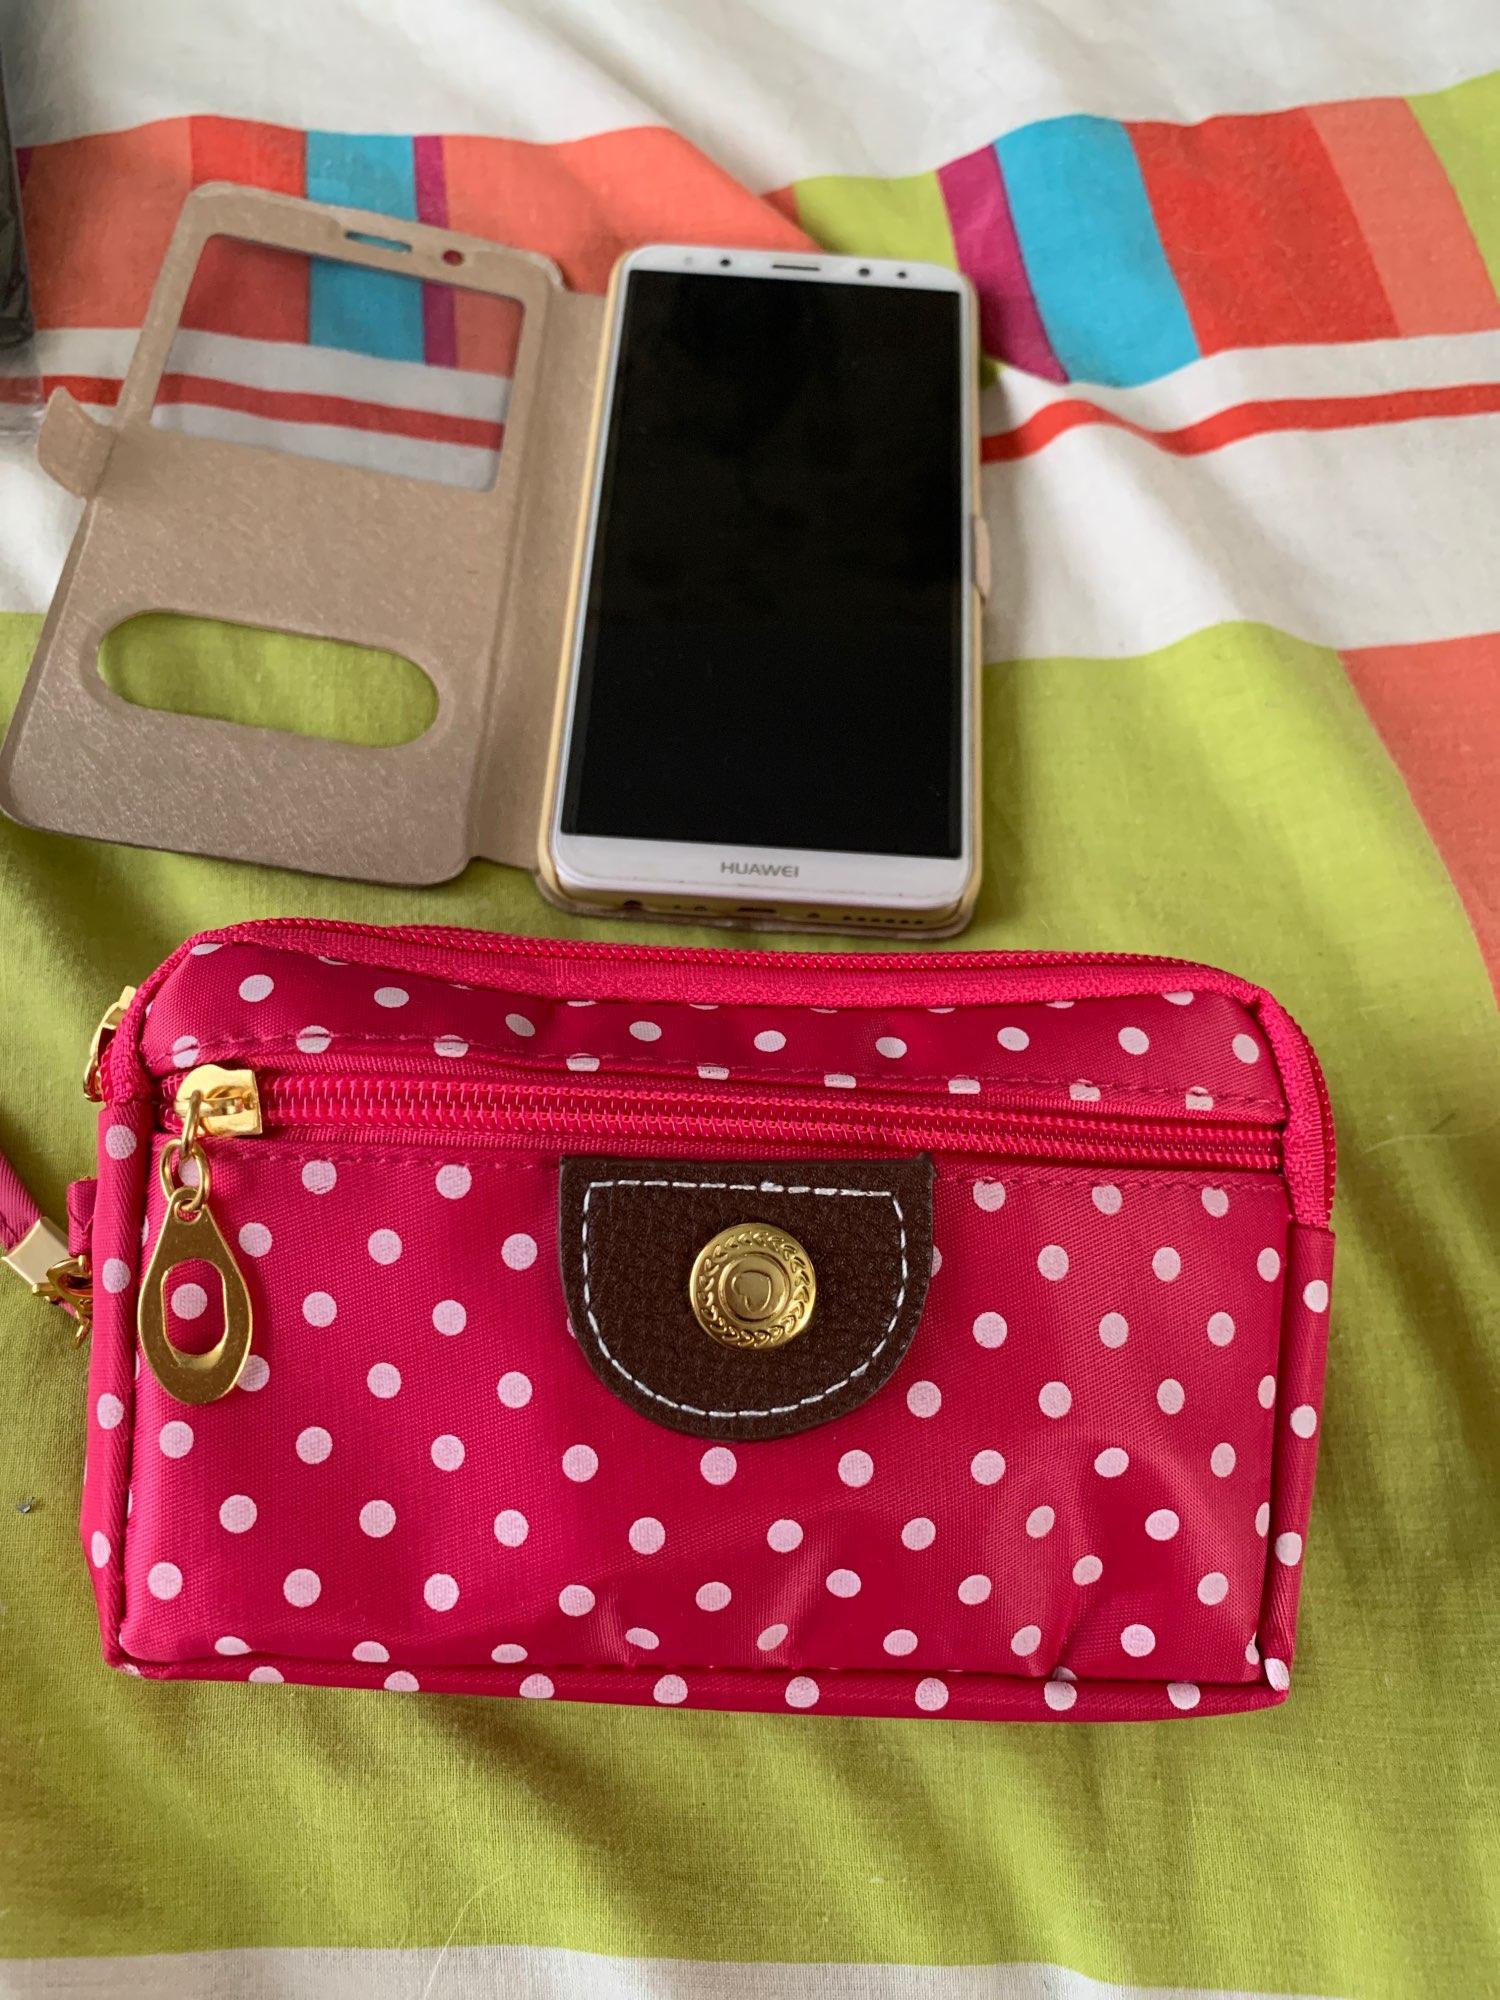 Fashion Women Wallets Small Handbags Canvas Dot Lady Zipper Moneybags Clutch Coin Purse Pocket Wallet Cards Holder Wristlet Bags|wristlet bag|wallet card holderwomen wallets small - AliExpress